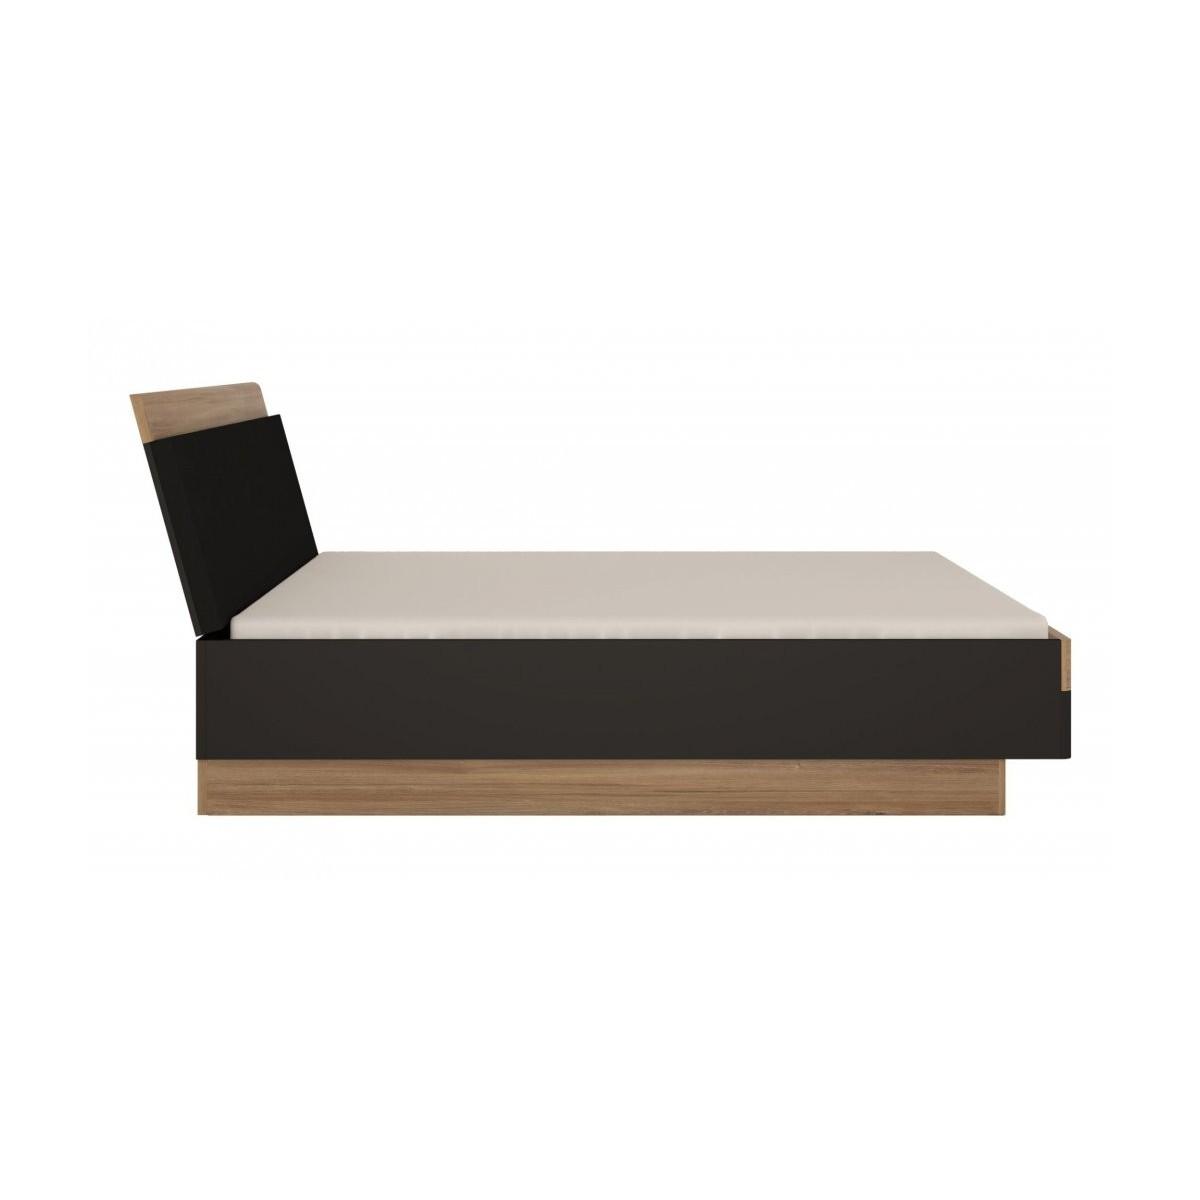 Łóżko 160 cm Dąb Stirling / Czarny Mat Monaco MOAL02